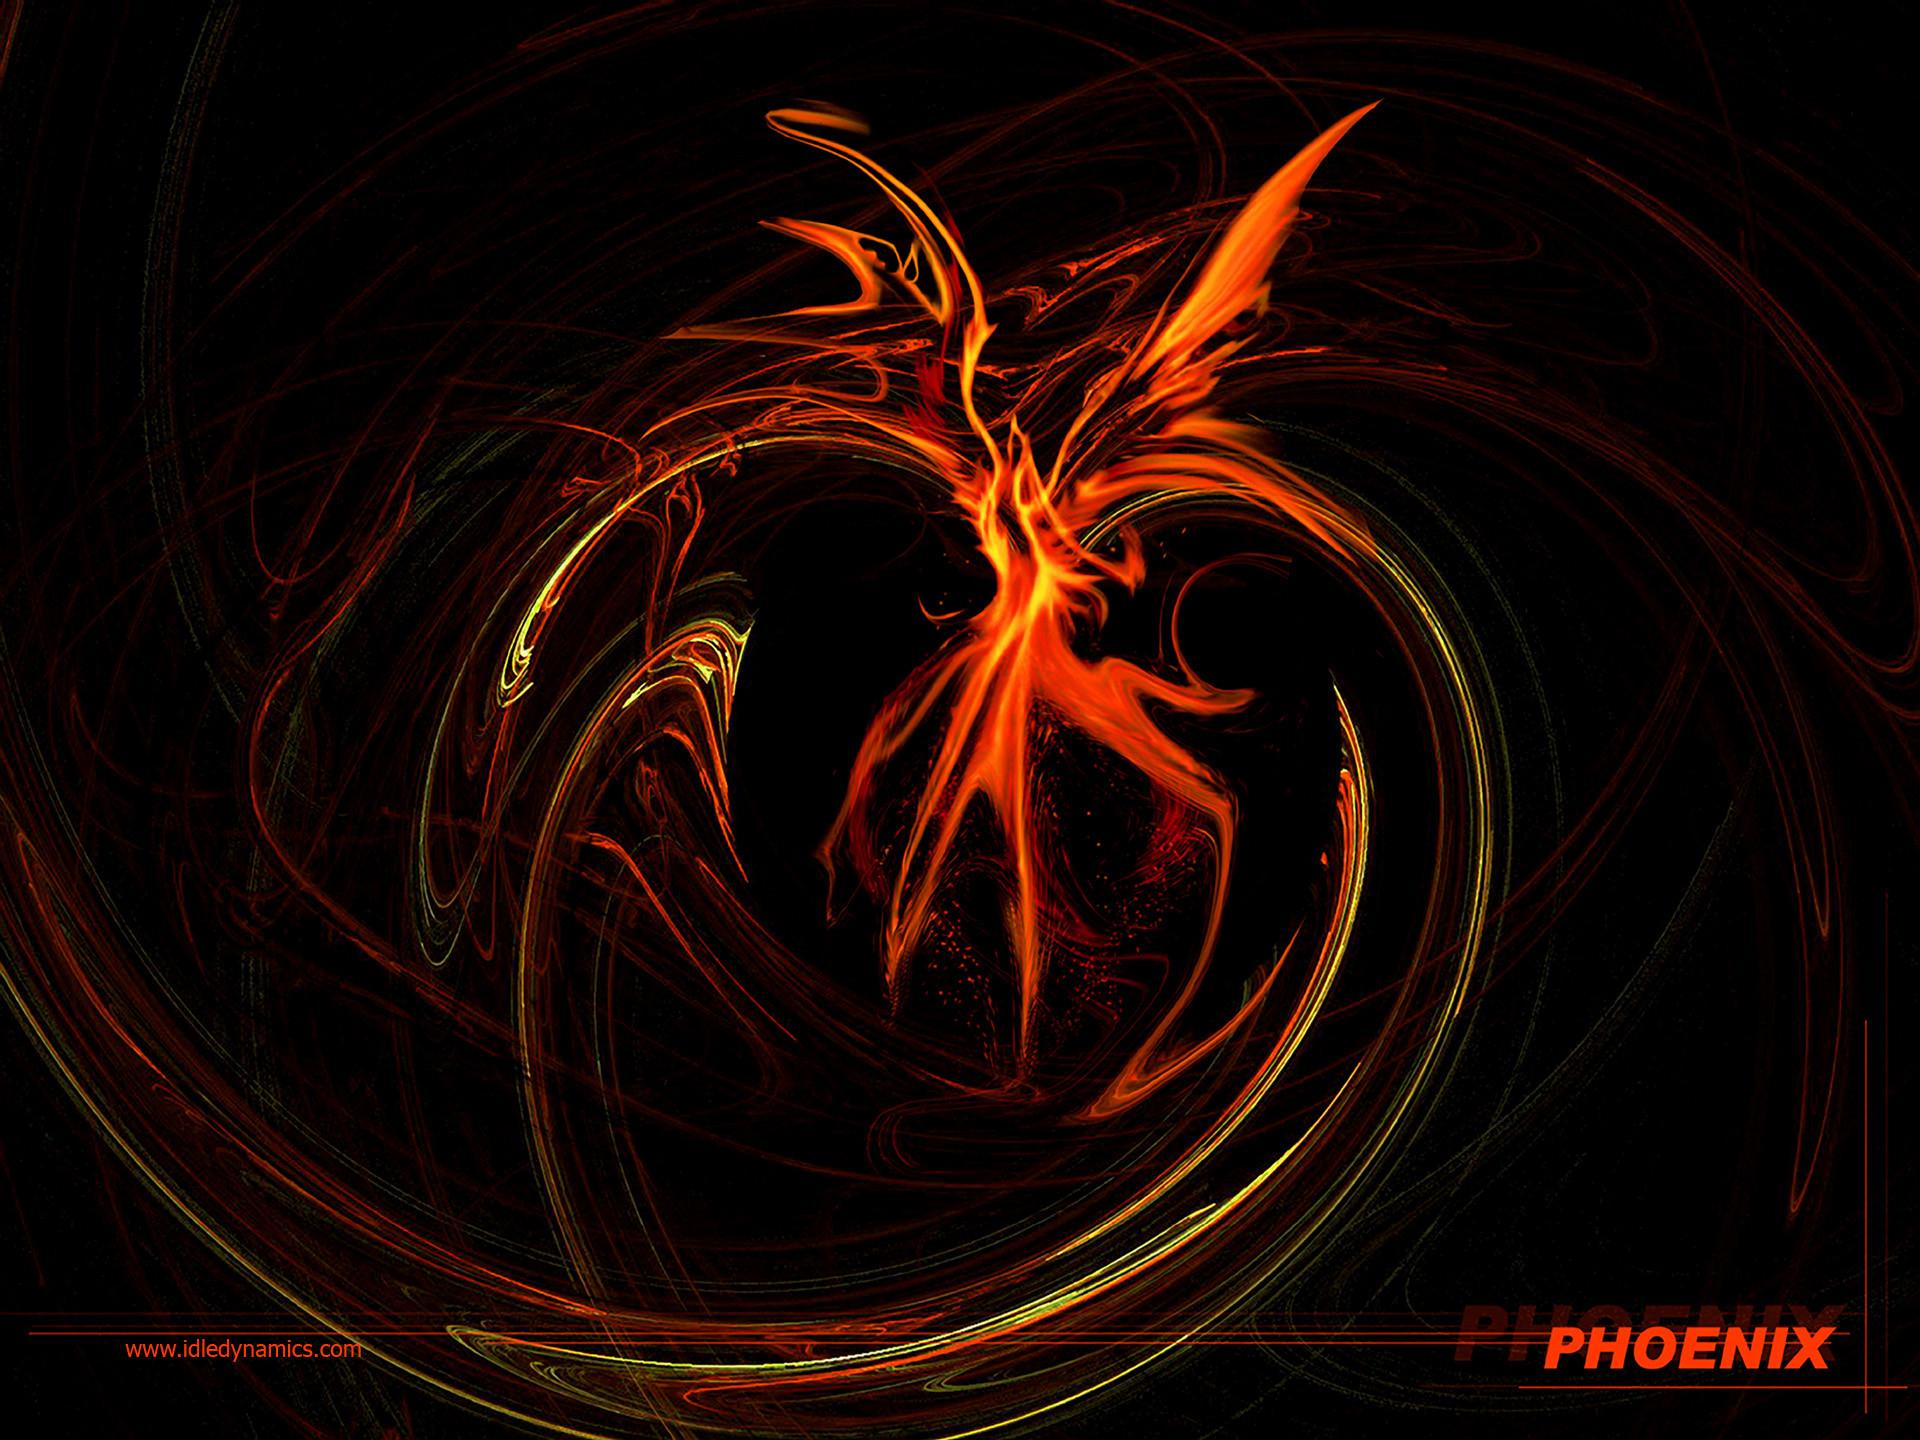 Phoenix Wallpaper Hd 80 Images